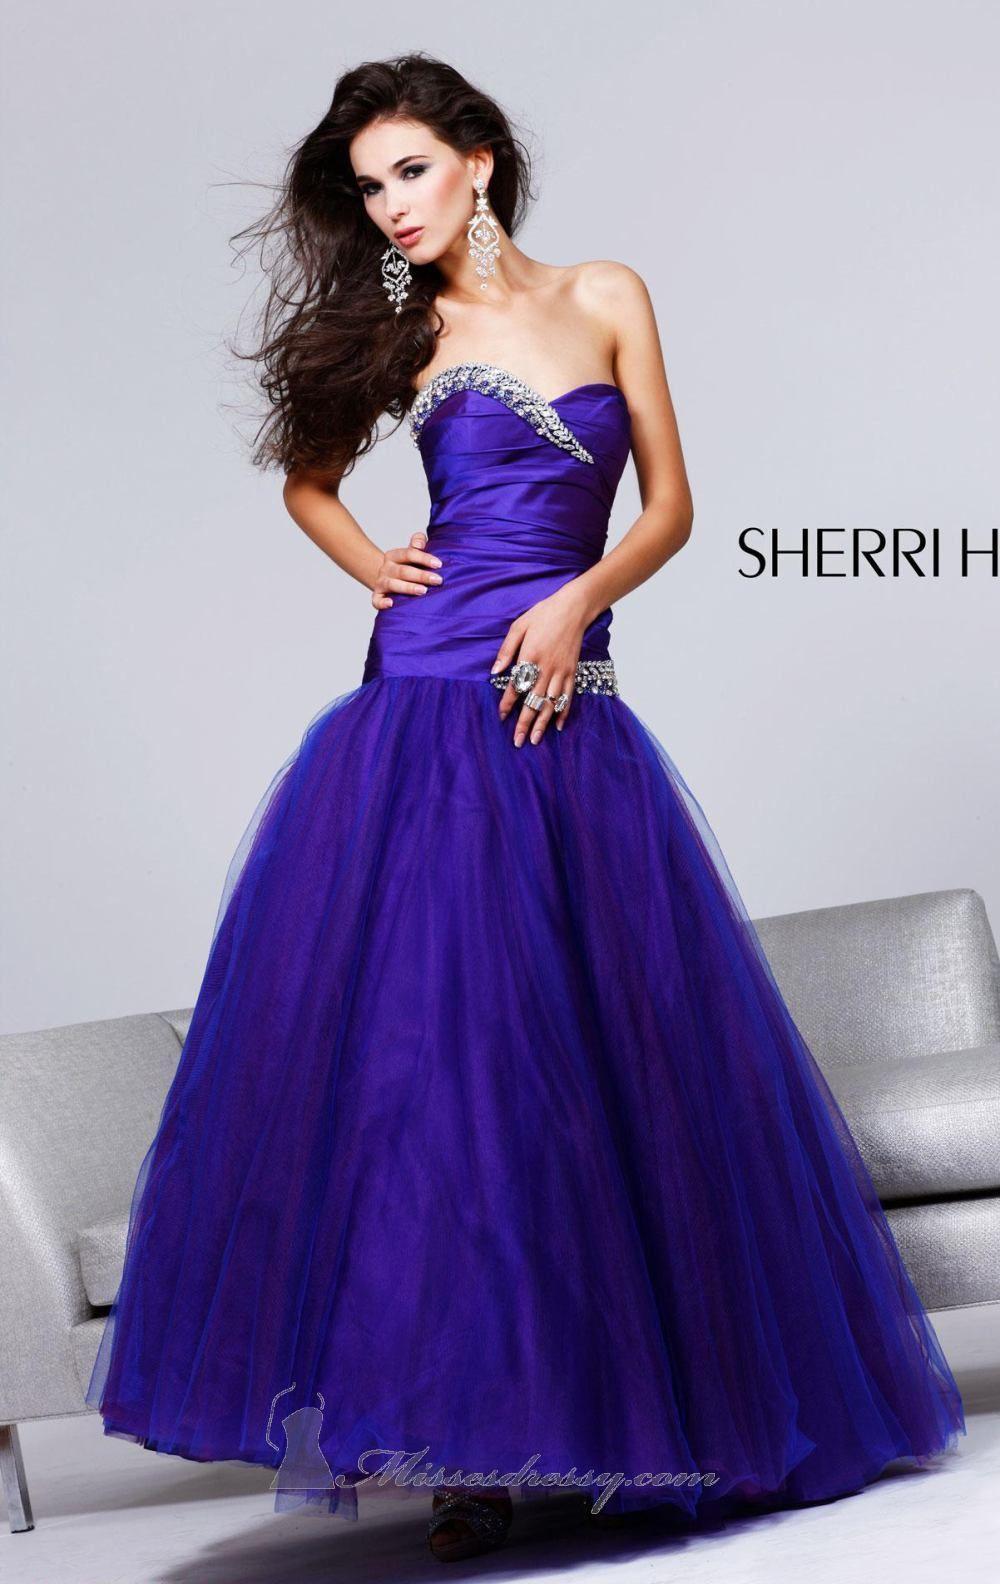 Sherri hill somethingbluetoo somethingbluetoo prom ideas